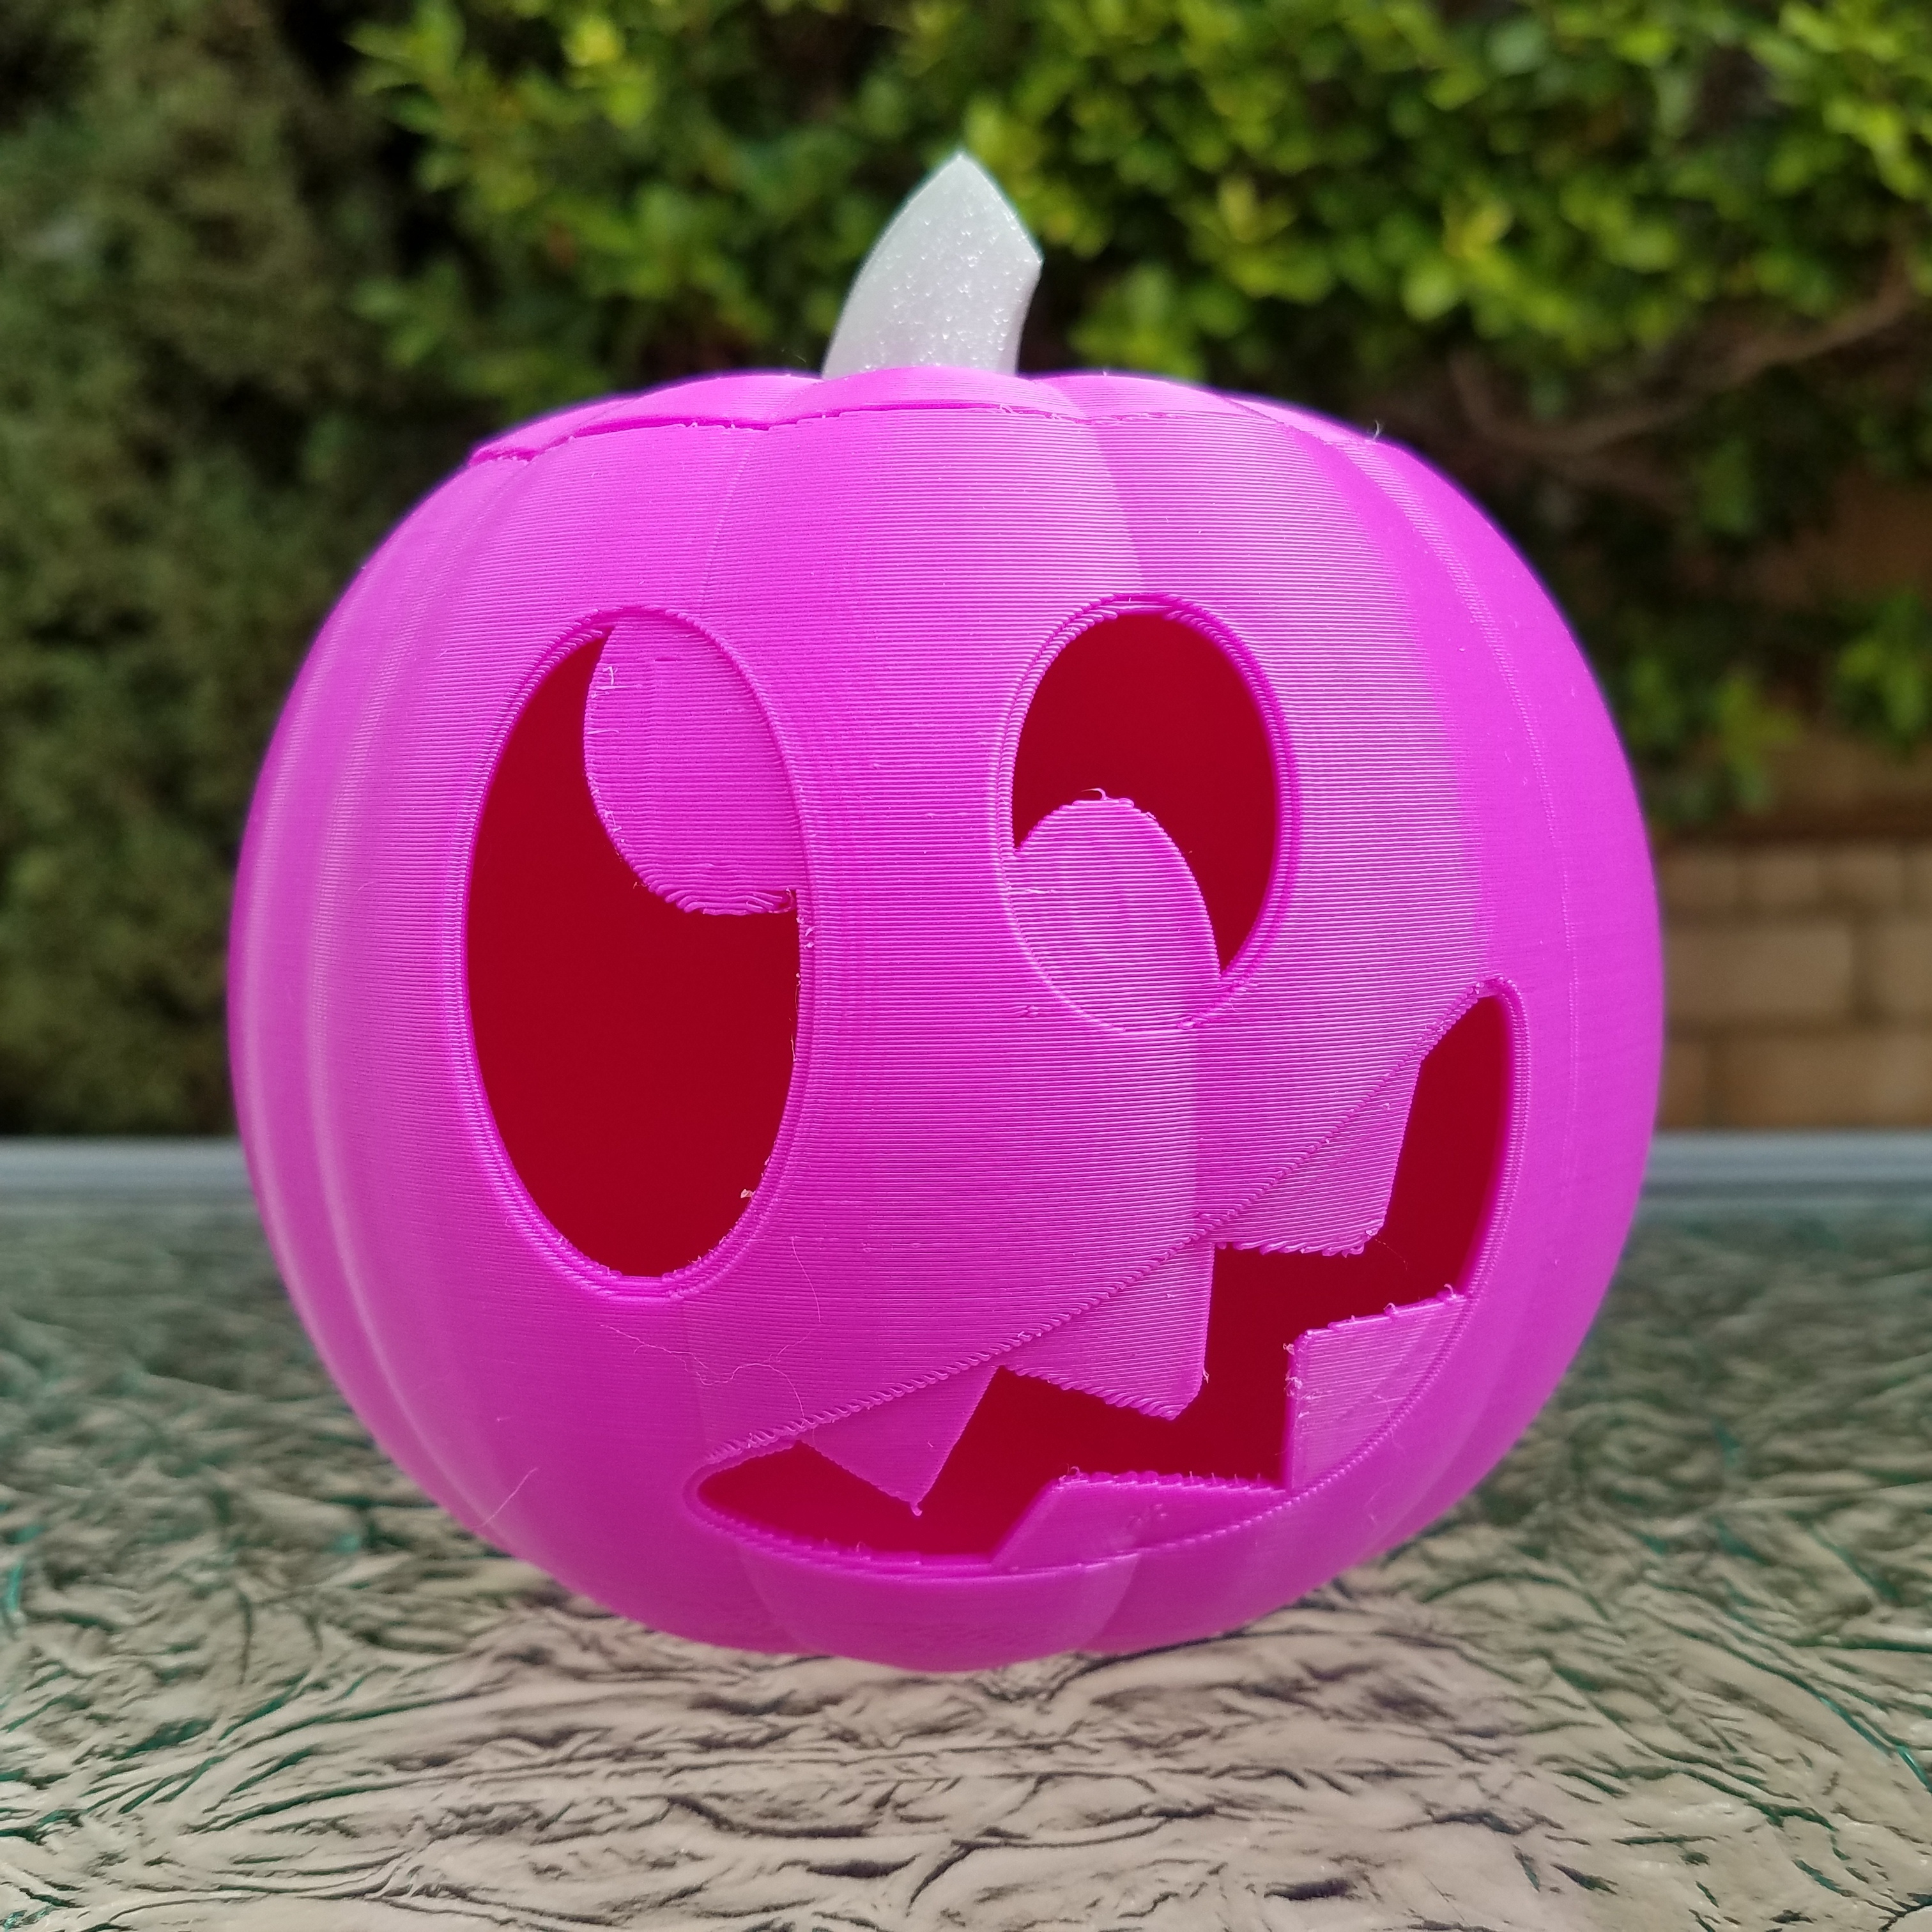 20201022_101407.jpg Download STL file Jack-O'-Lantern Silly Monster • 3D printing model, abbymath